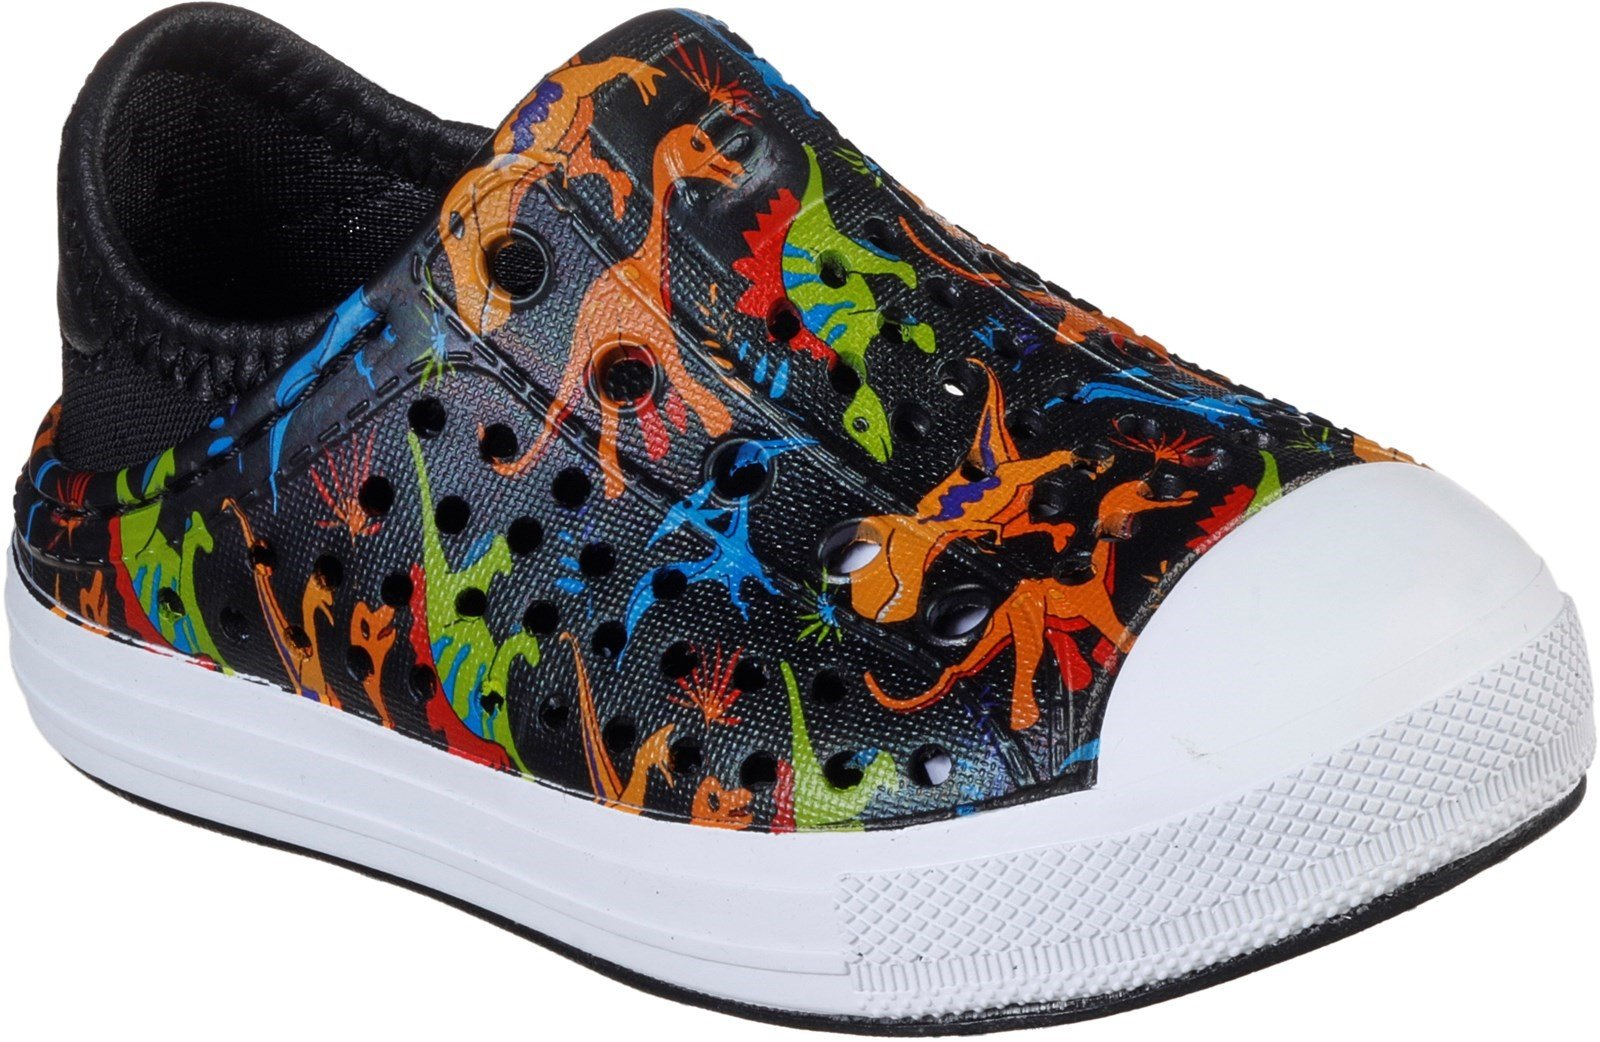 Skechers Women's Guzman Steps Lil Dino Beach Sandal Multicolor 30784 - Black/Multi 4